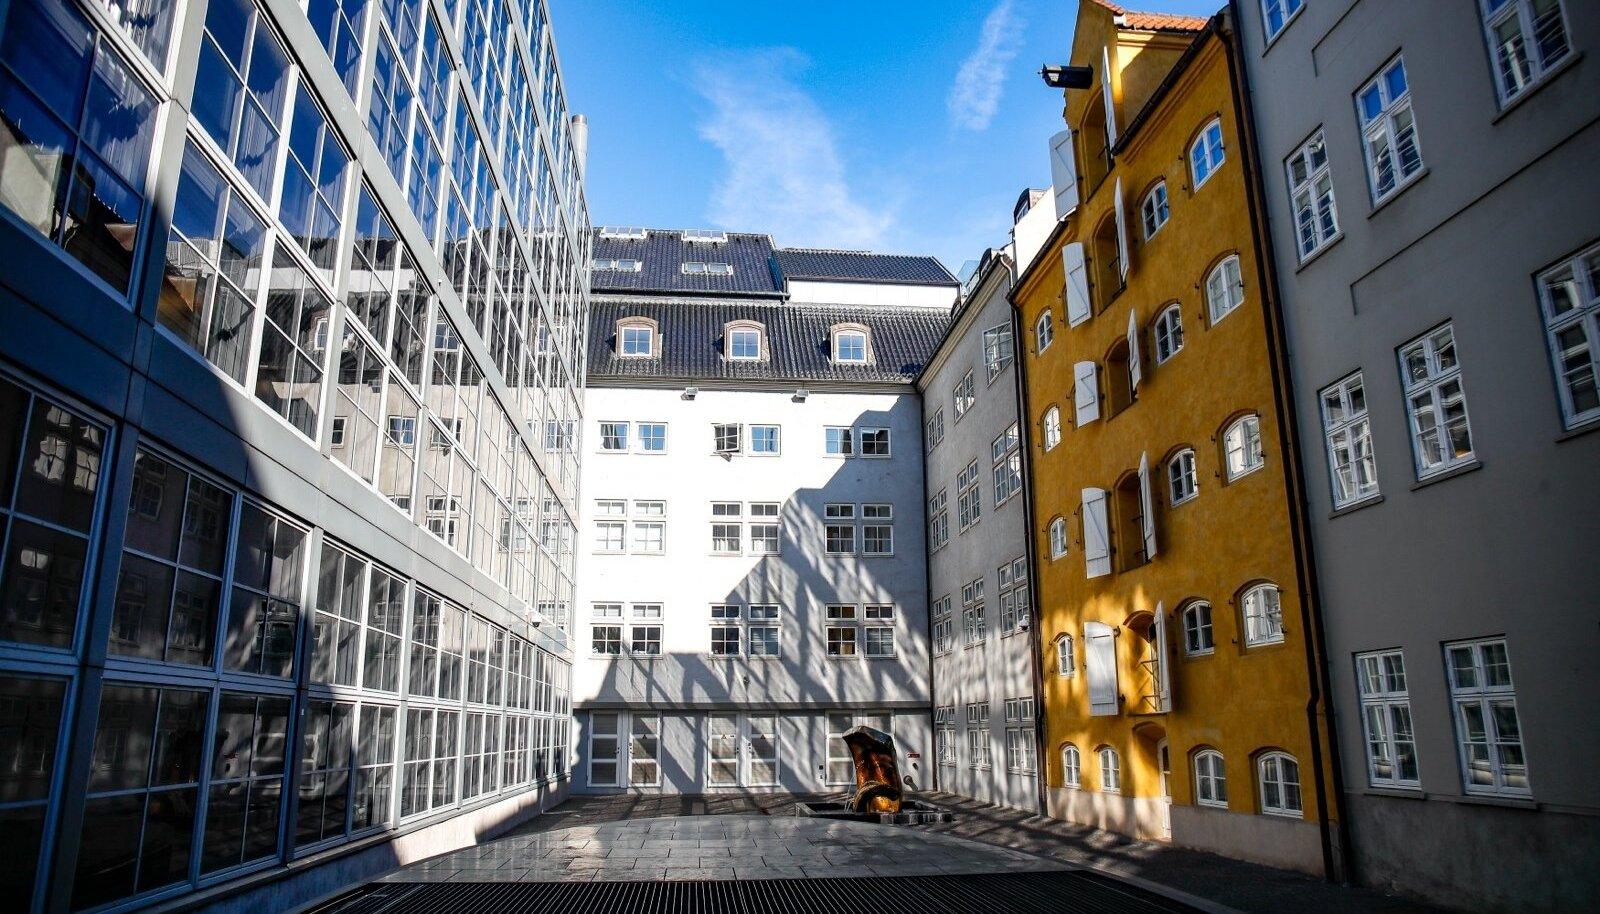 Danske Banki kvartal Kopenhaagenis